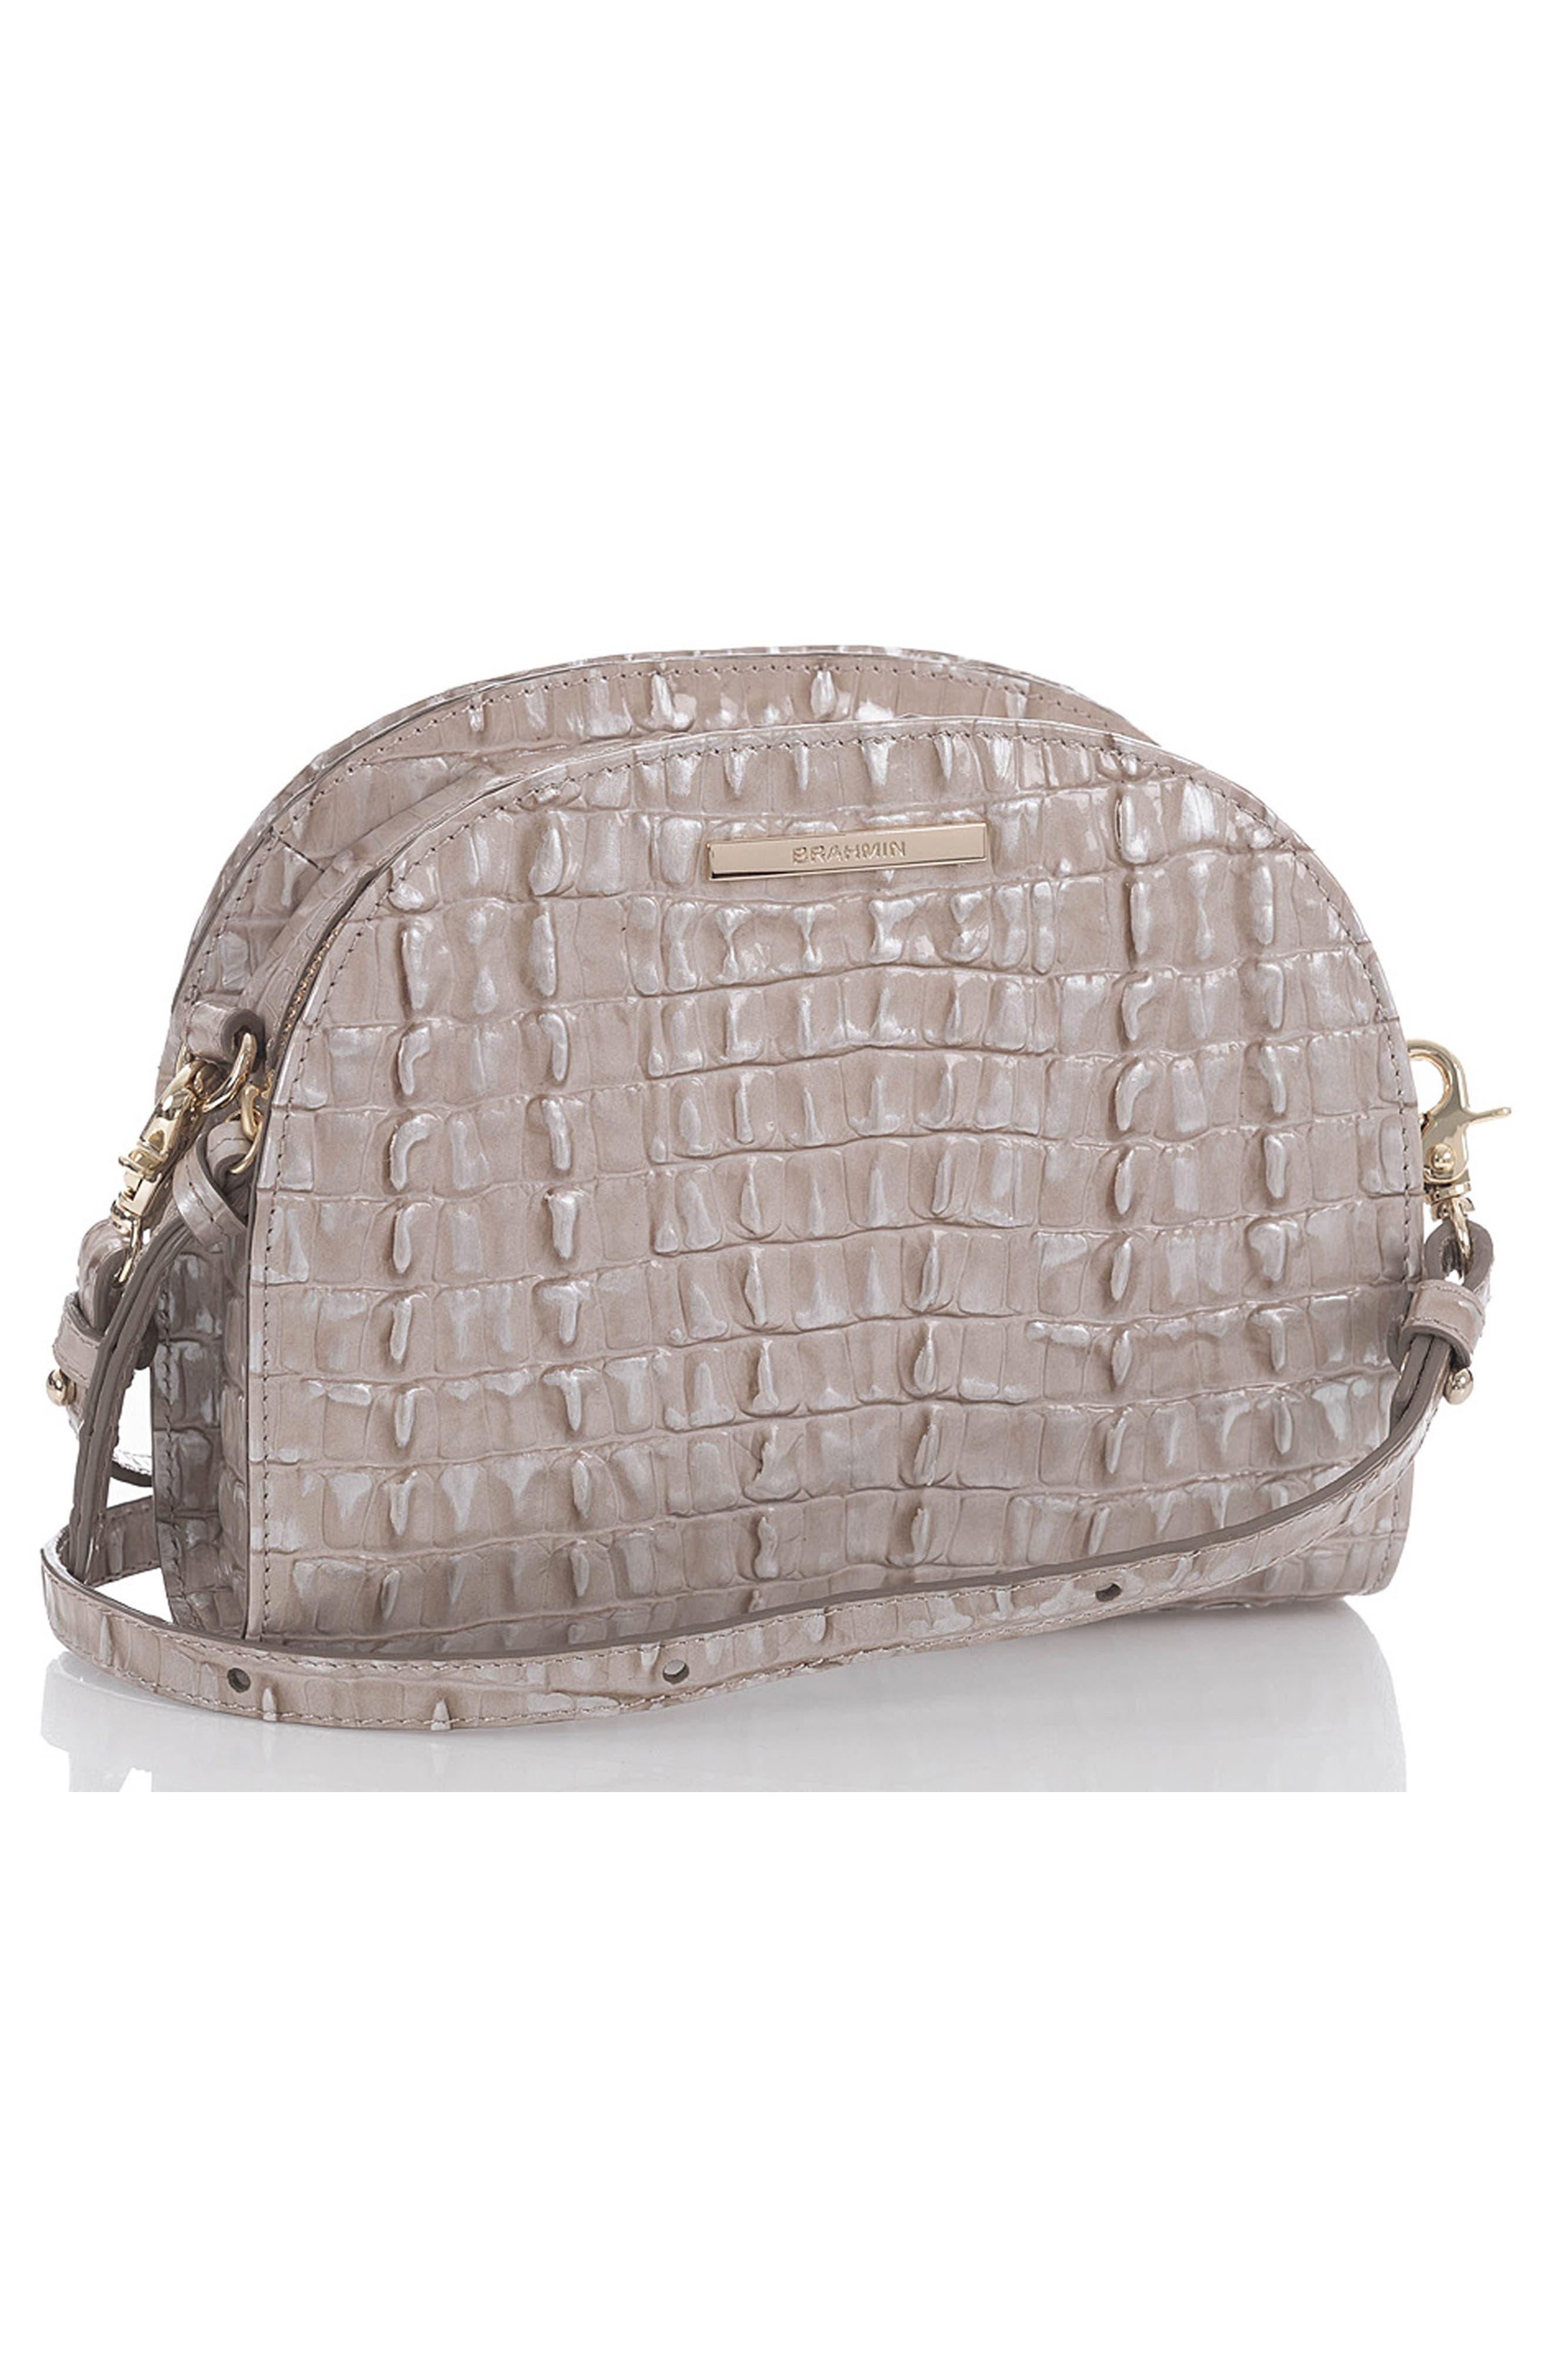 BRAHMIN, Leah Croc Embossed Leather Crossbody Bag, Alternate thumbnail 4, color, 020